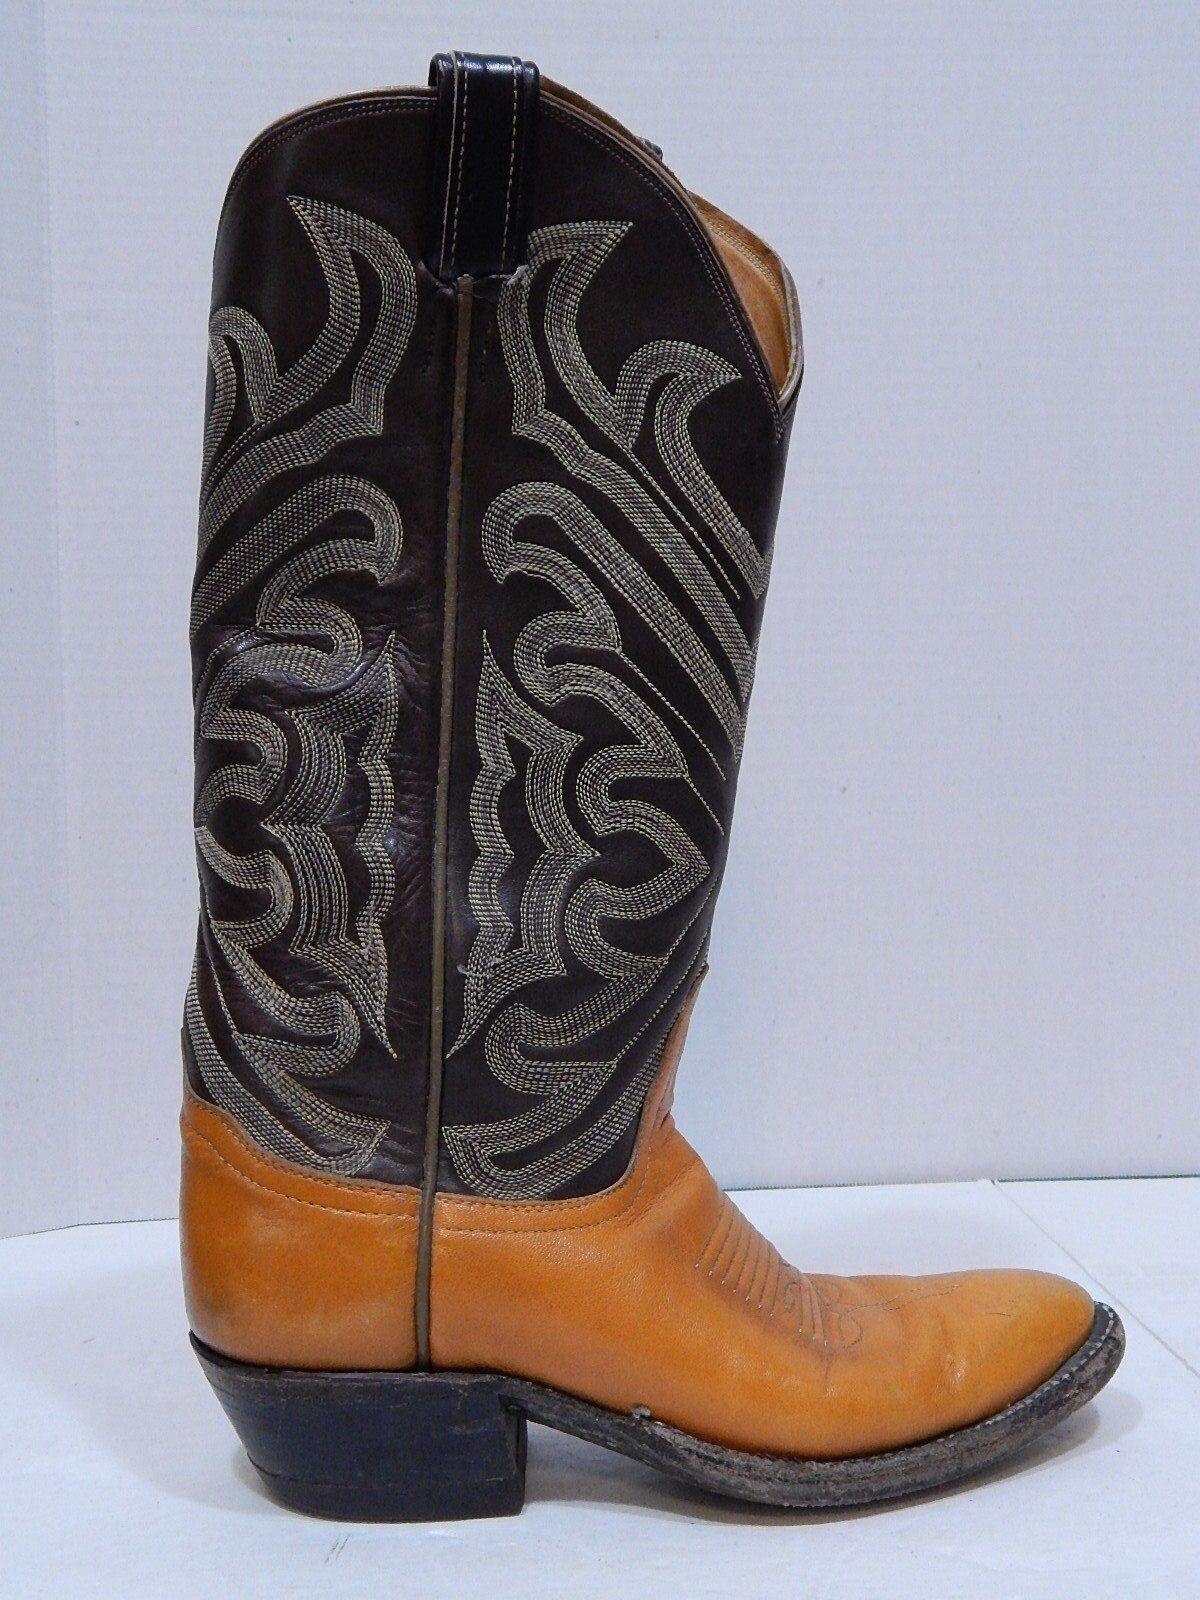 Tony Lama Boots Tall Shaft Vintage Western Cowboy Boots Womens SIZE 6 NARROW